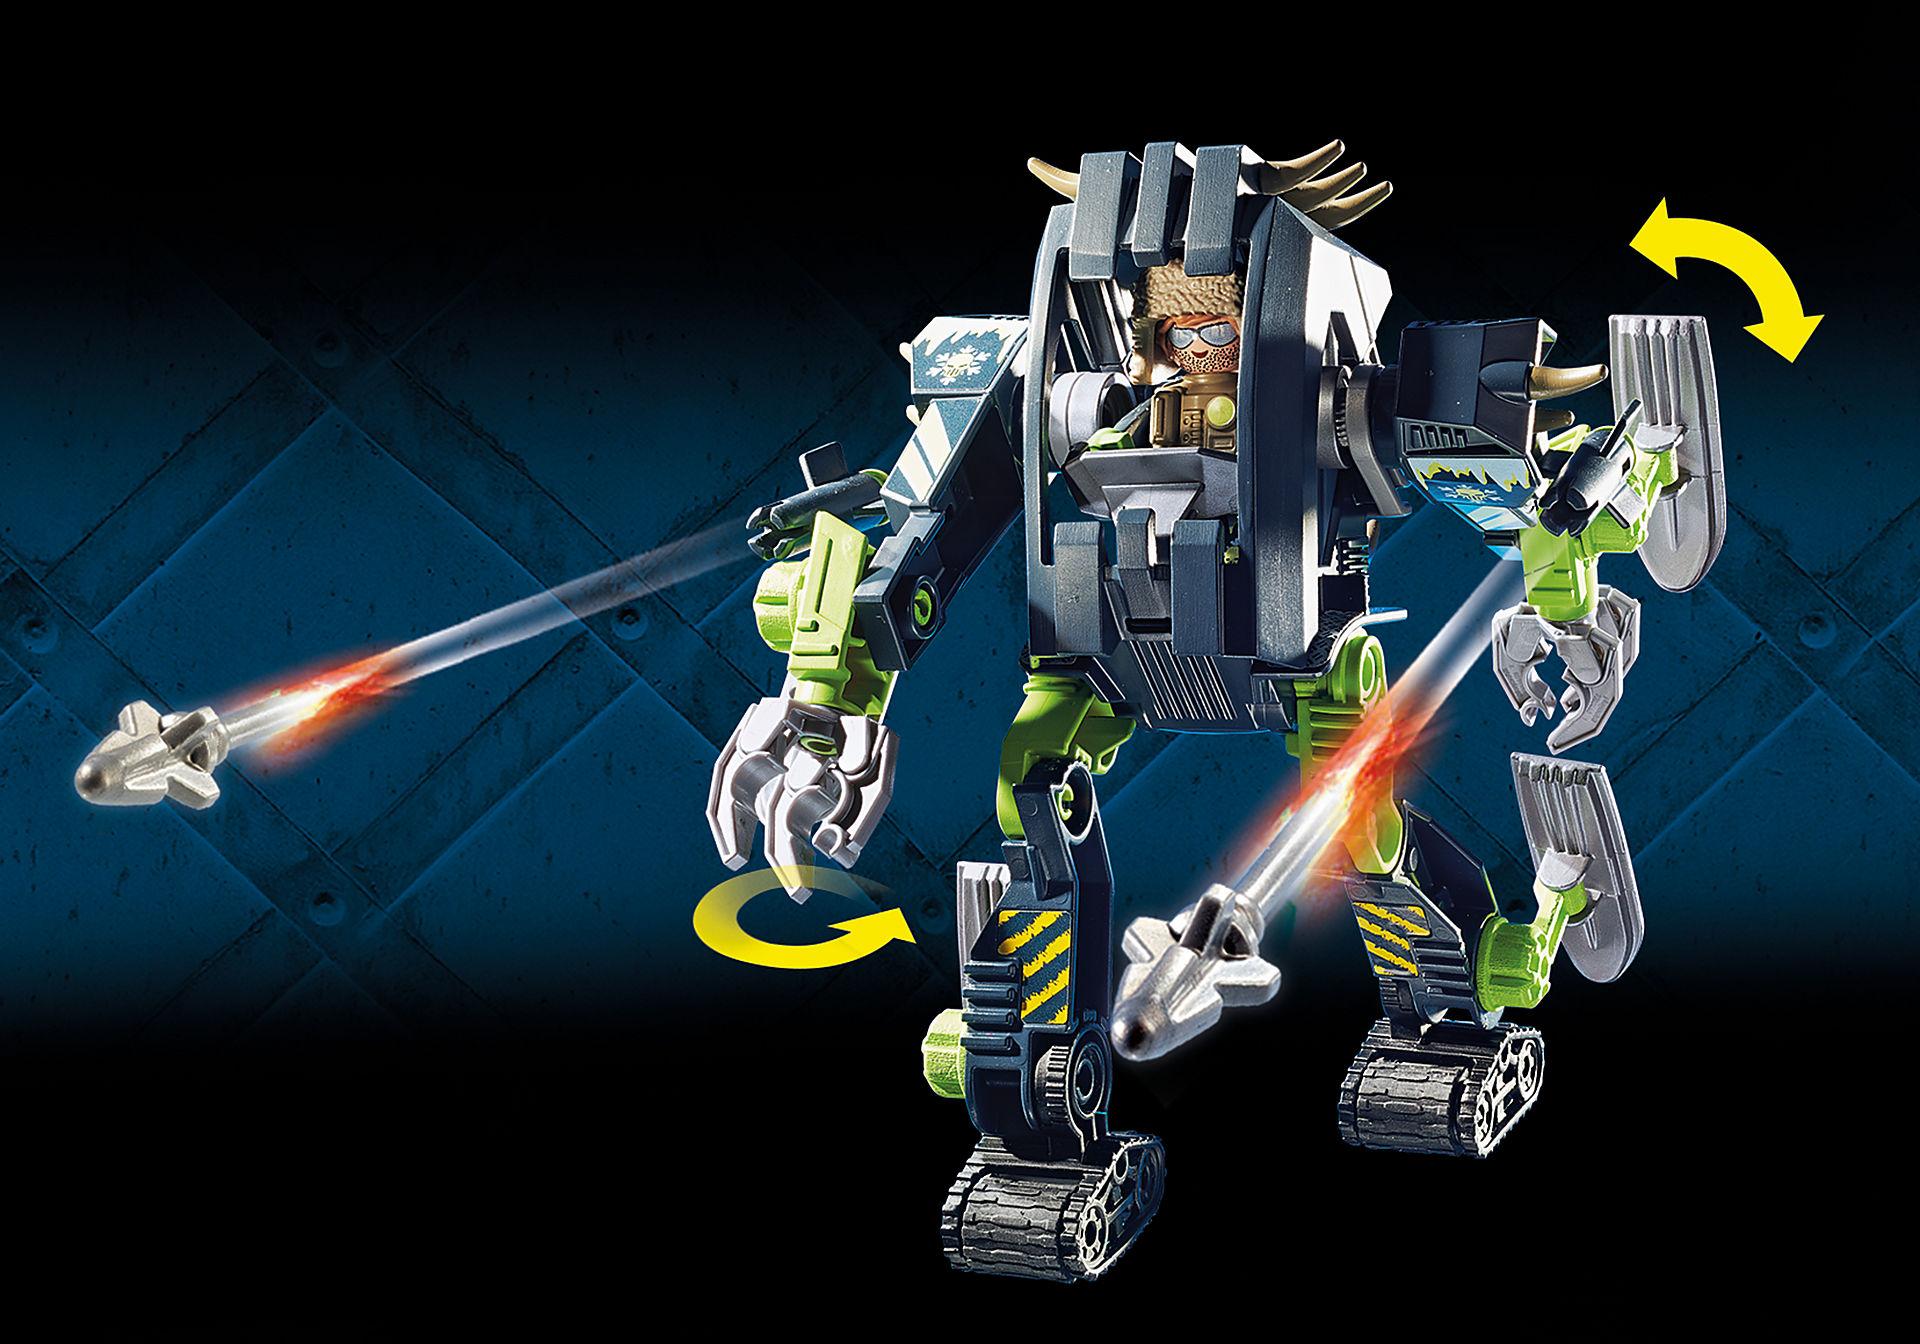 70233 Robot zoom image4